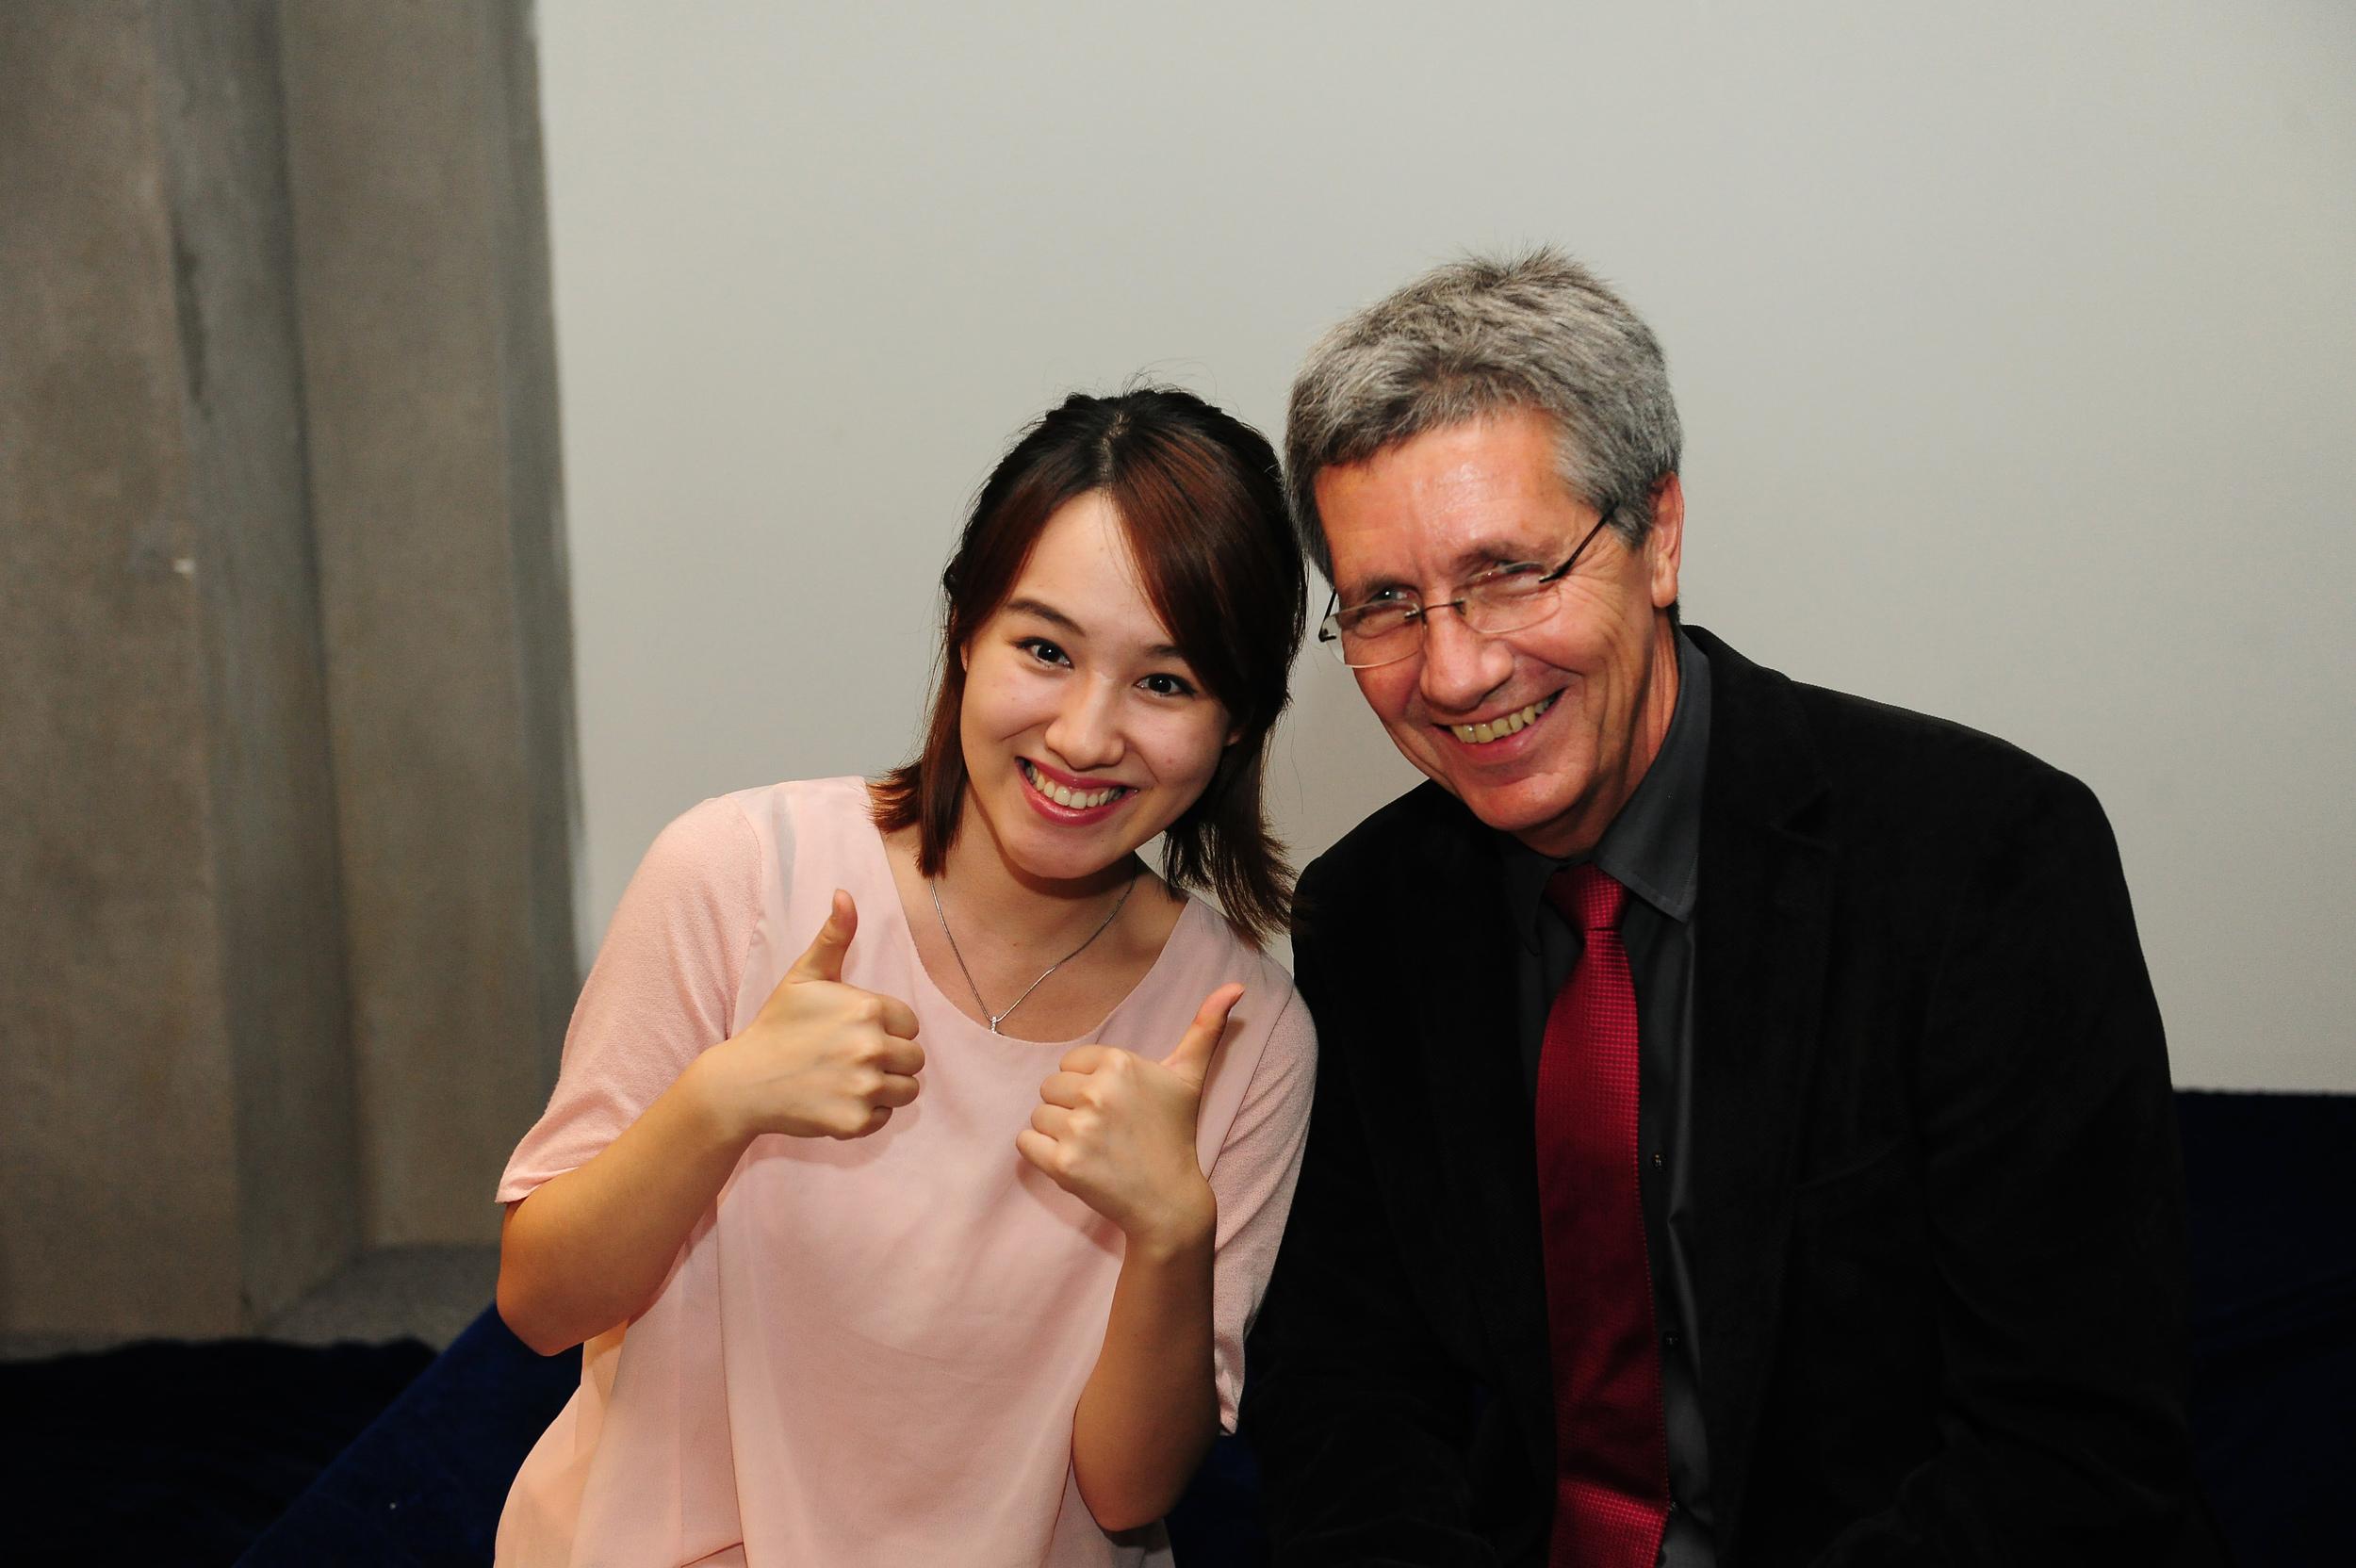 Mr. Thomas Grunwald with the actress Ms. Yujiao Gong.